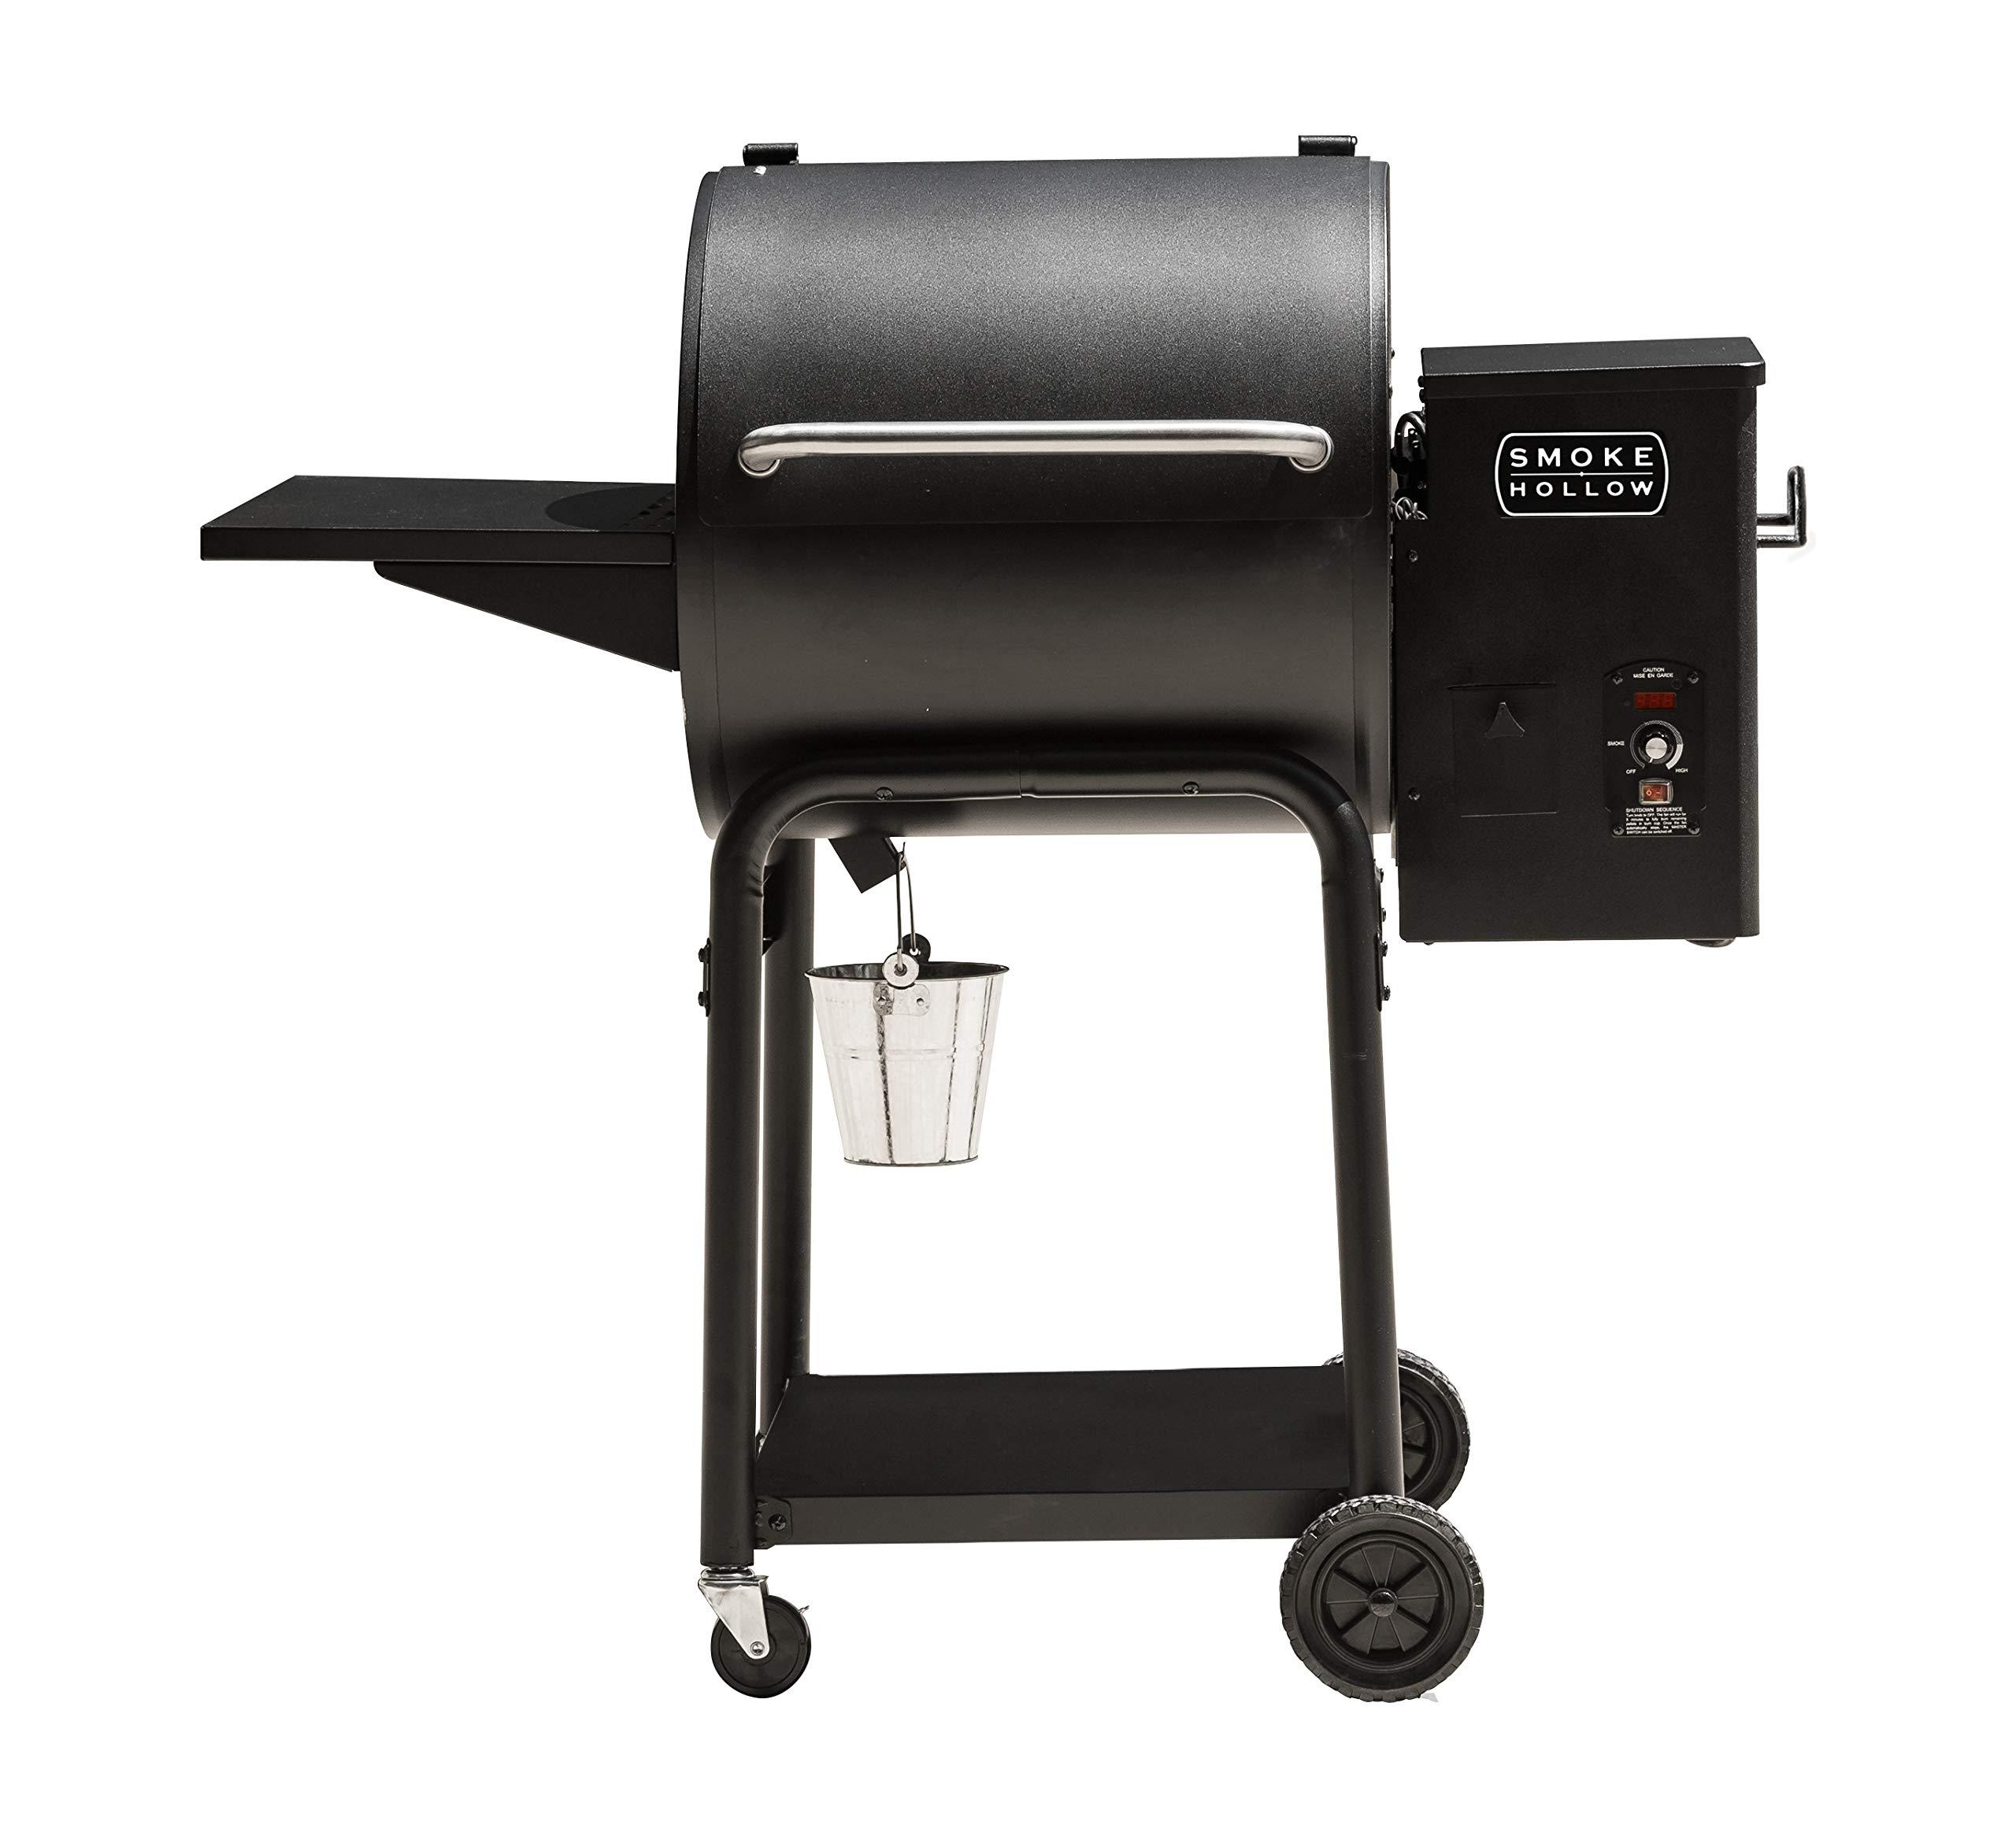 Masterbuilt Smoke Hollow WG400B Pellet Grill, Black by Masterbuilt